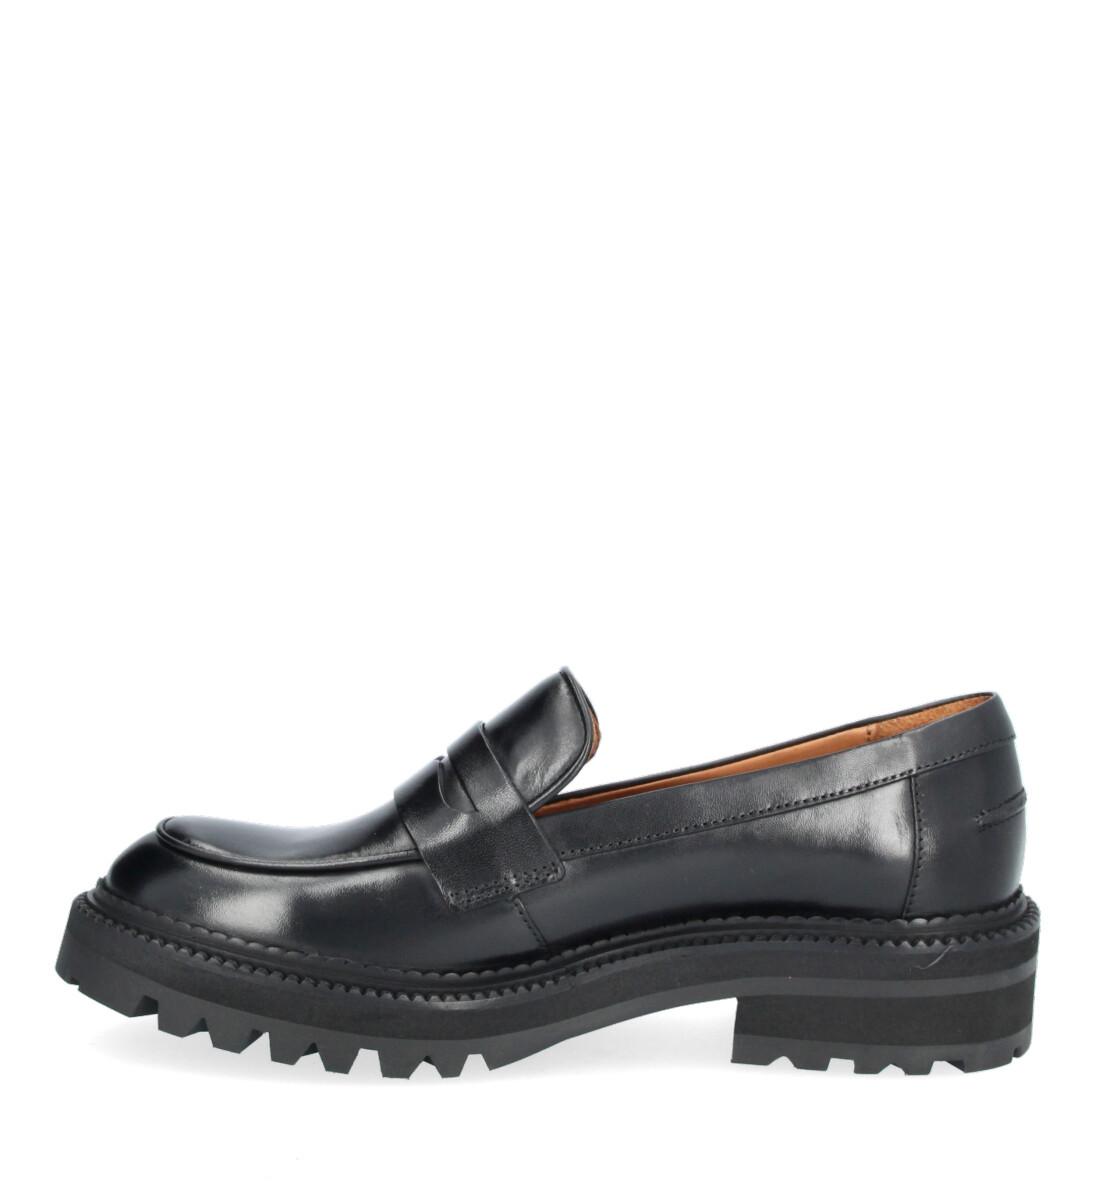 Billi bi A1360 loafer, Black, 36